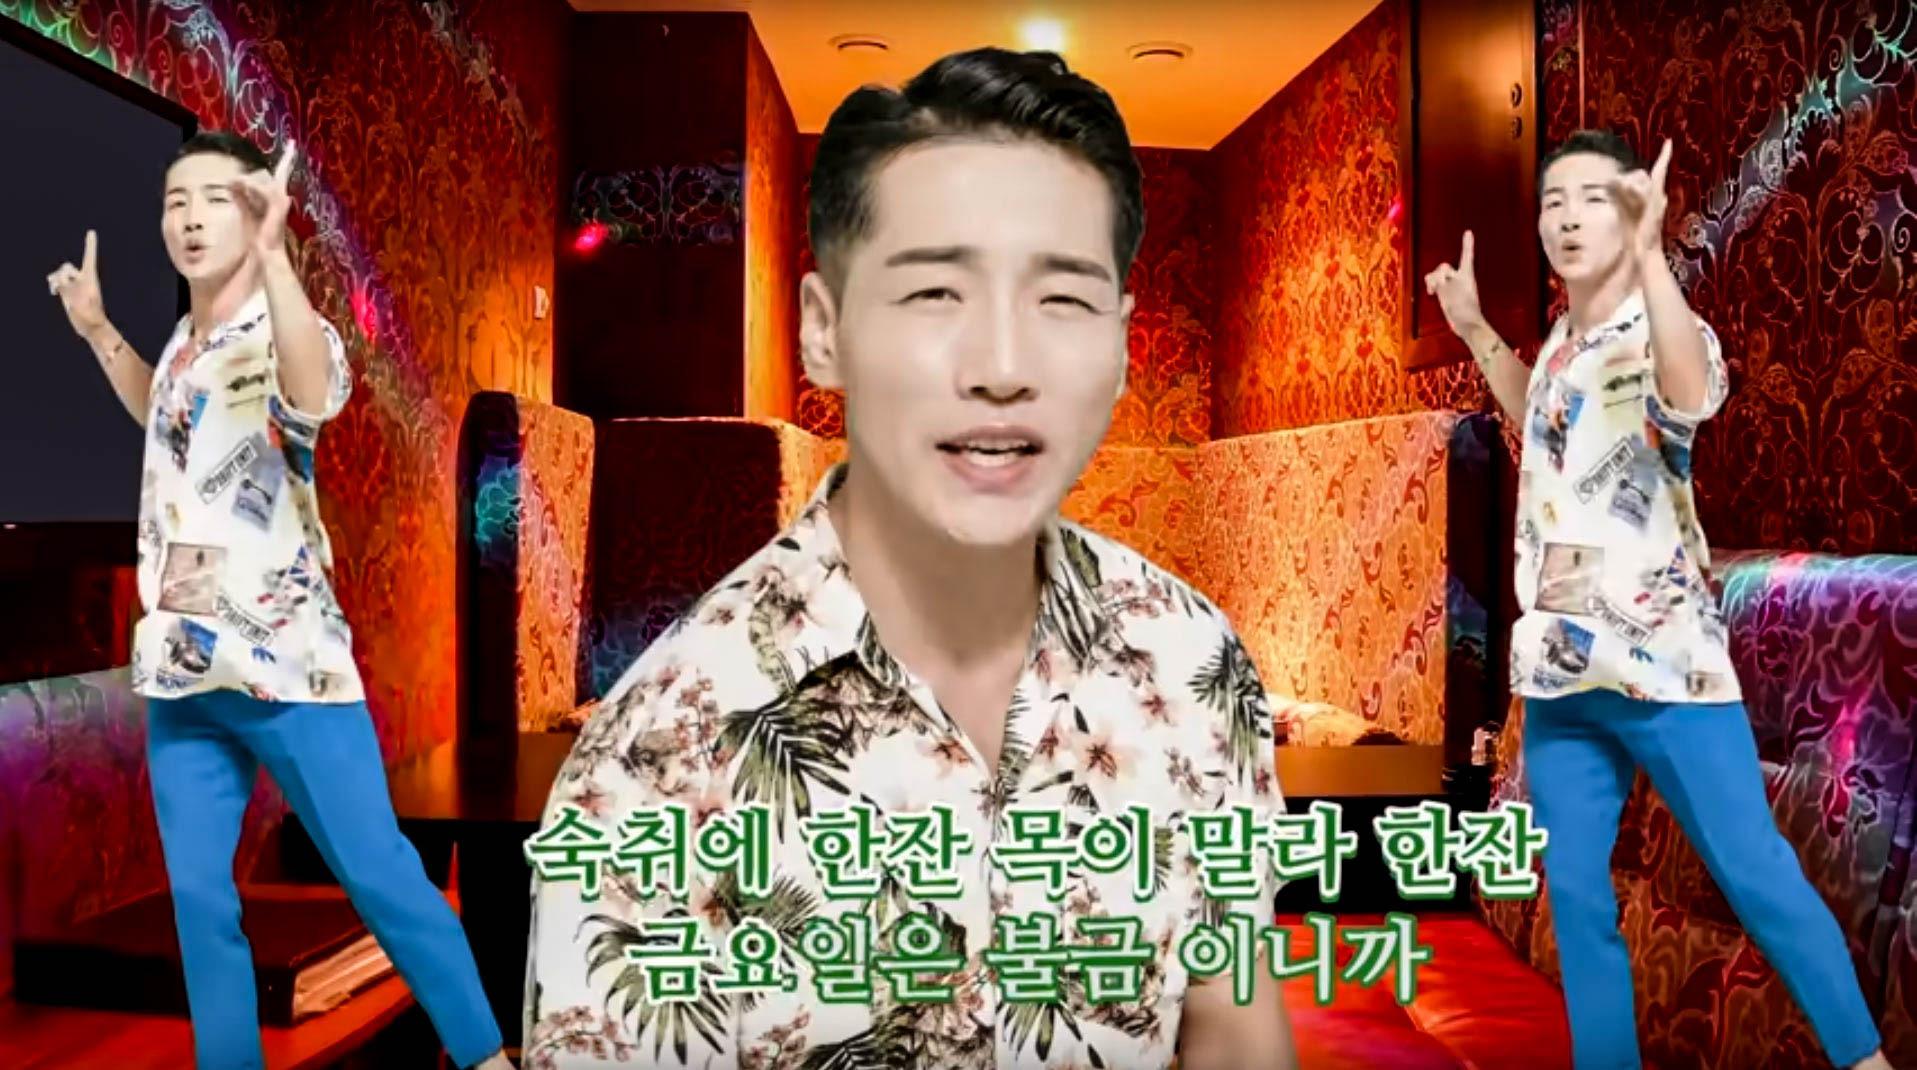 An image of a Korean music star wearing a yellow shirt